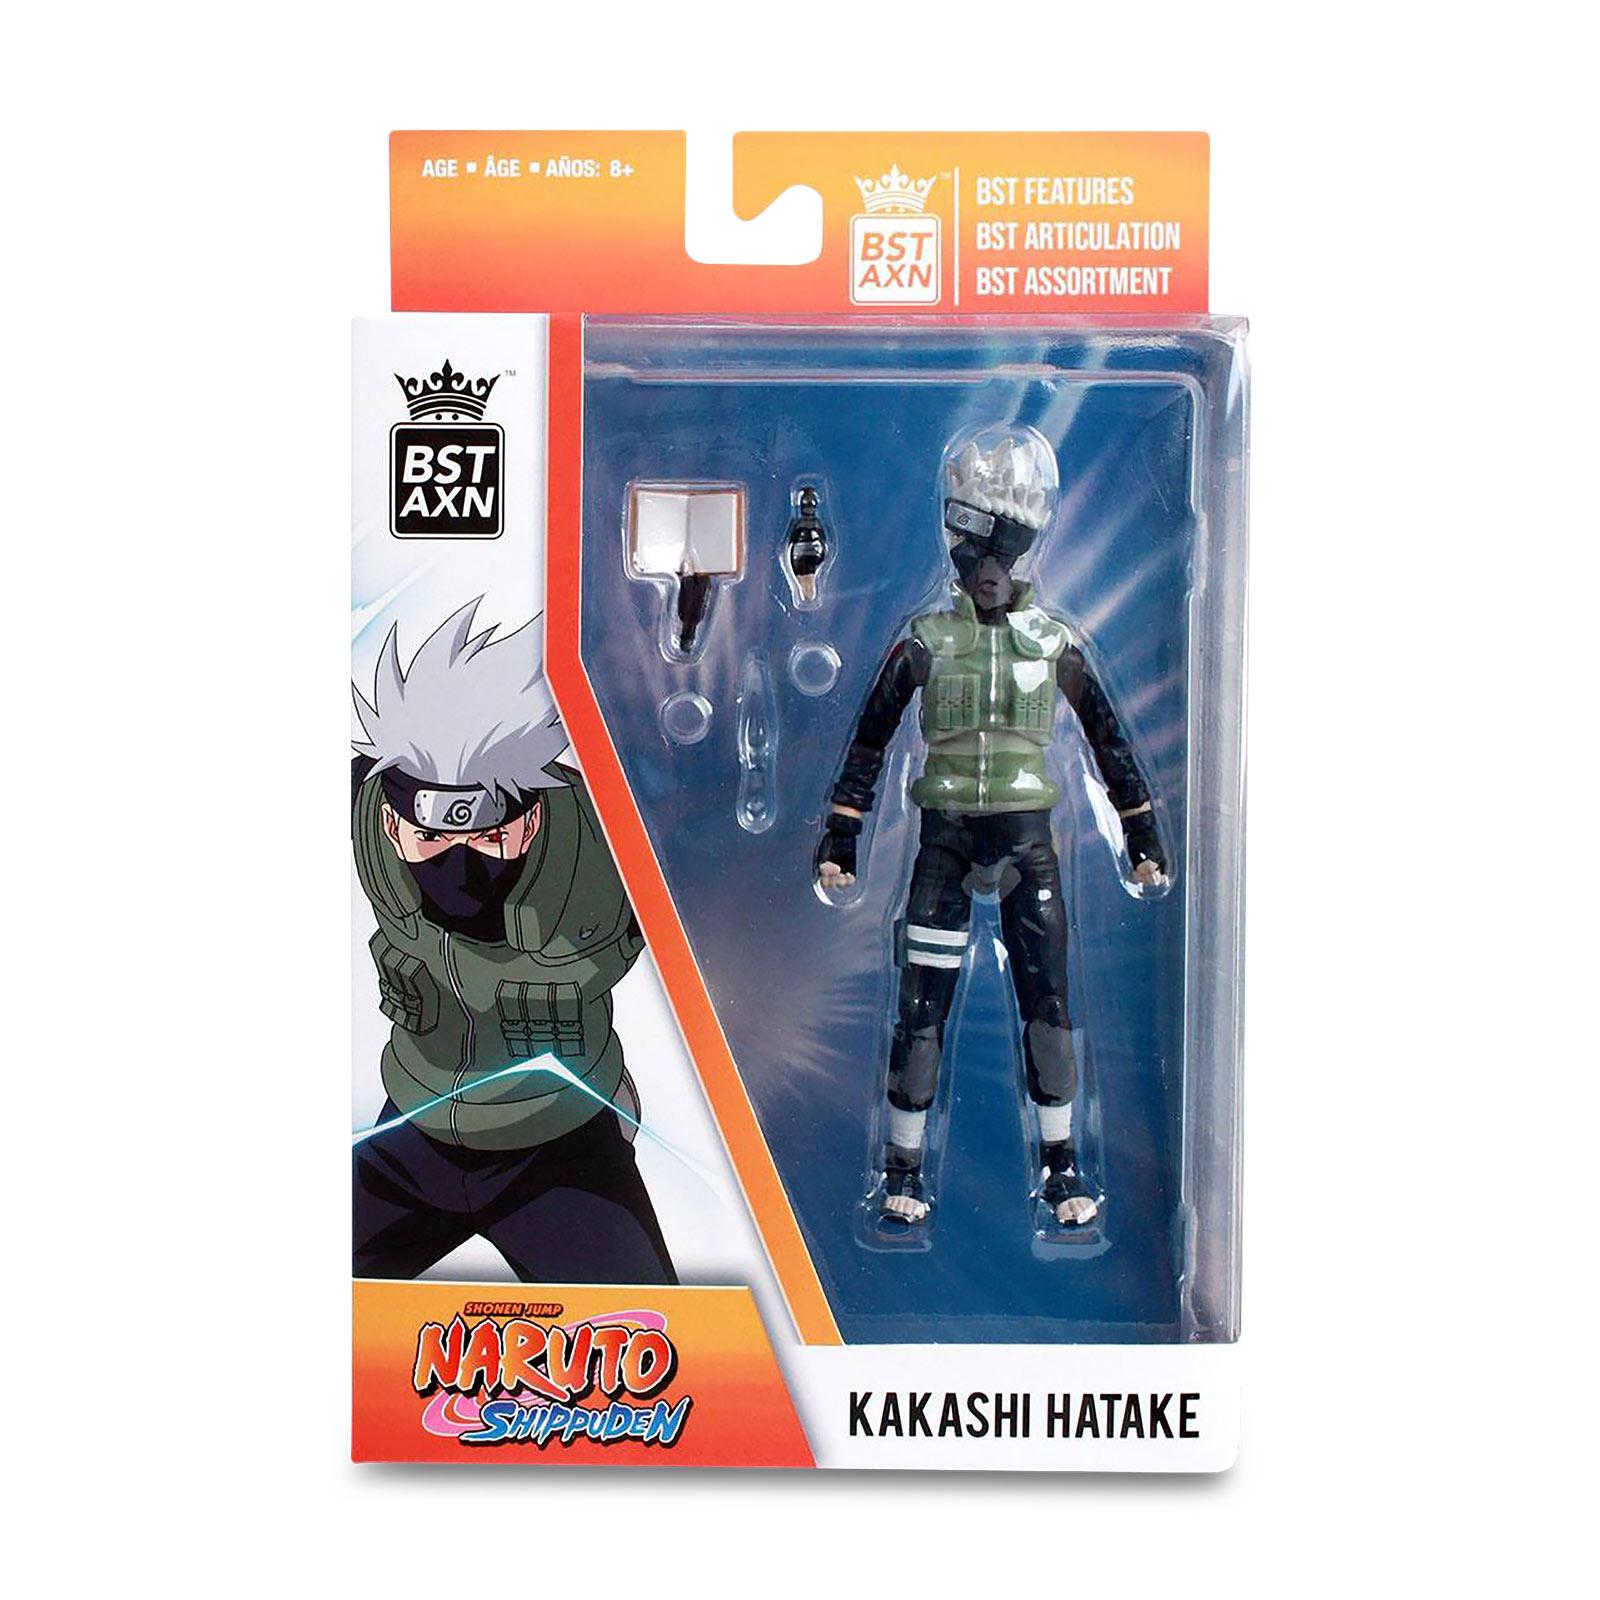 Naruto - Kakashi BST AXN Actionfigur 13 cm